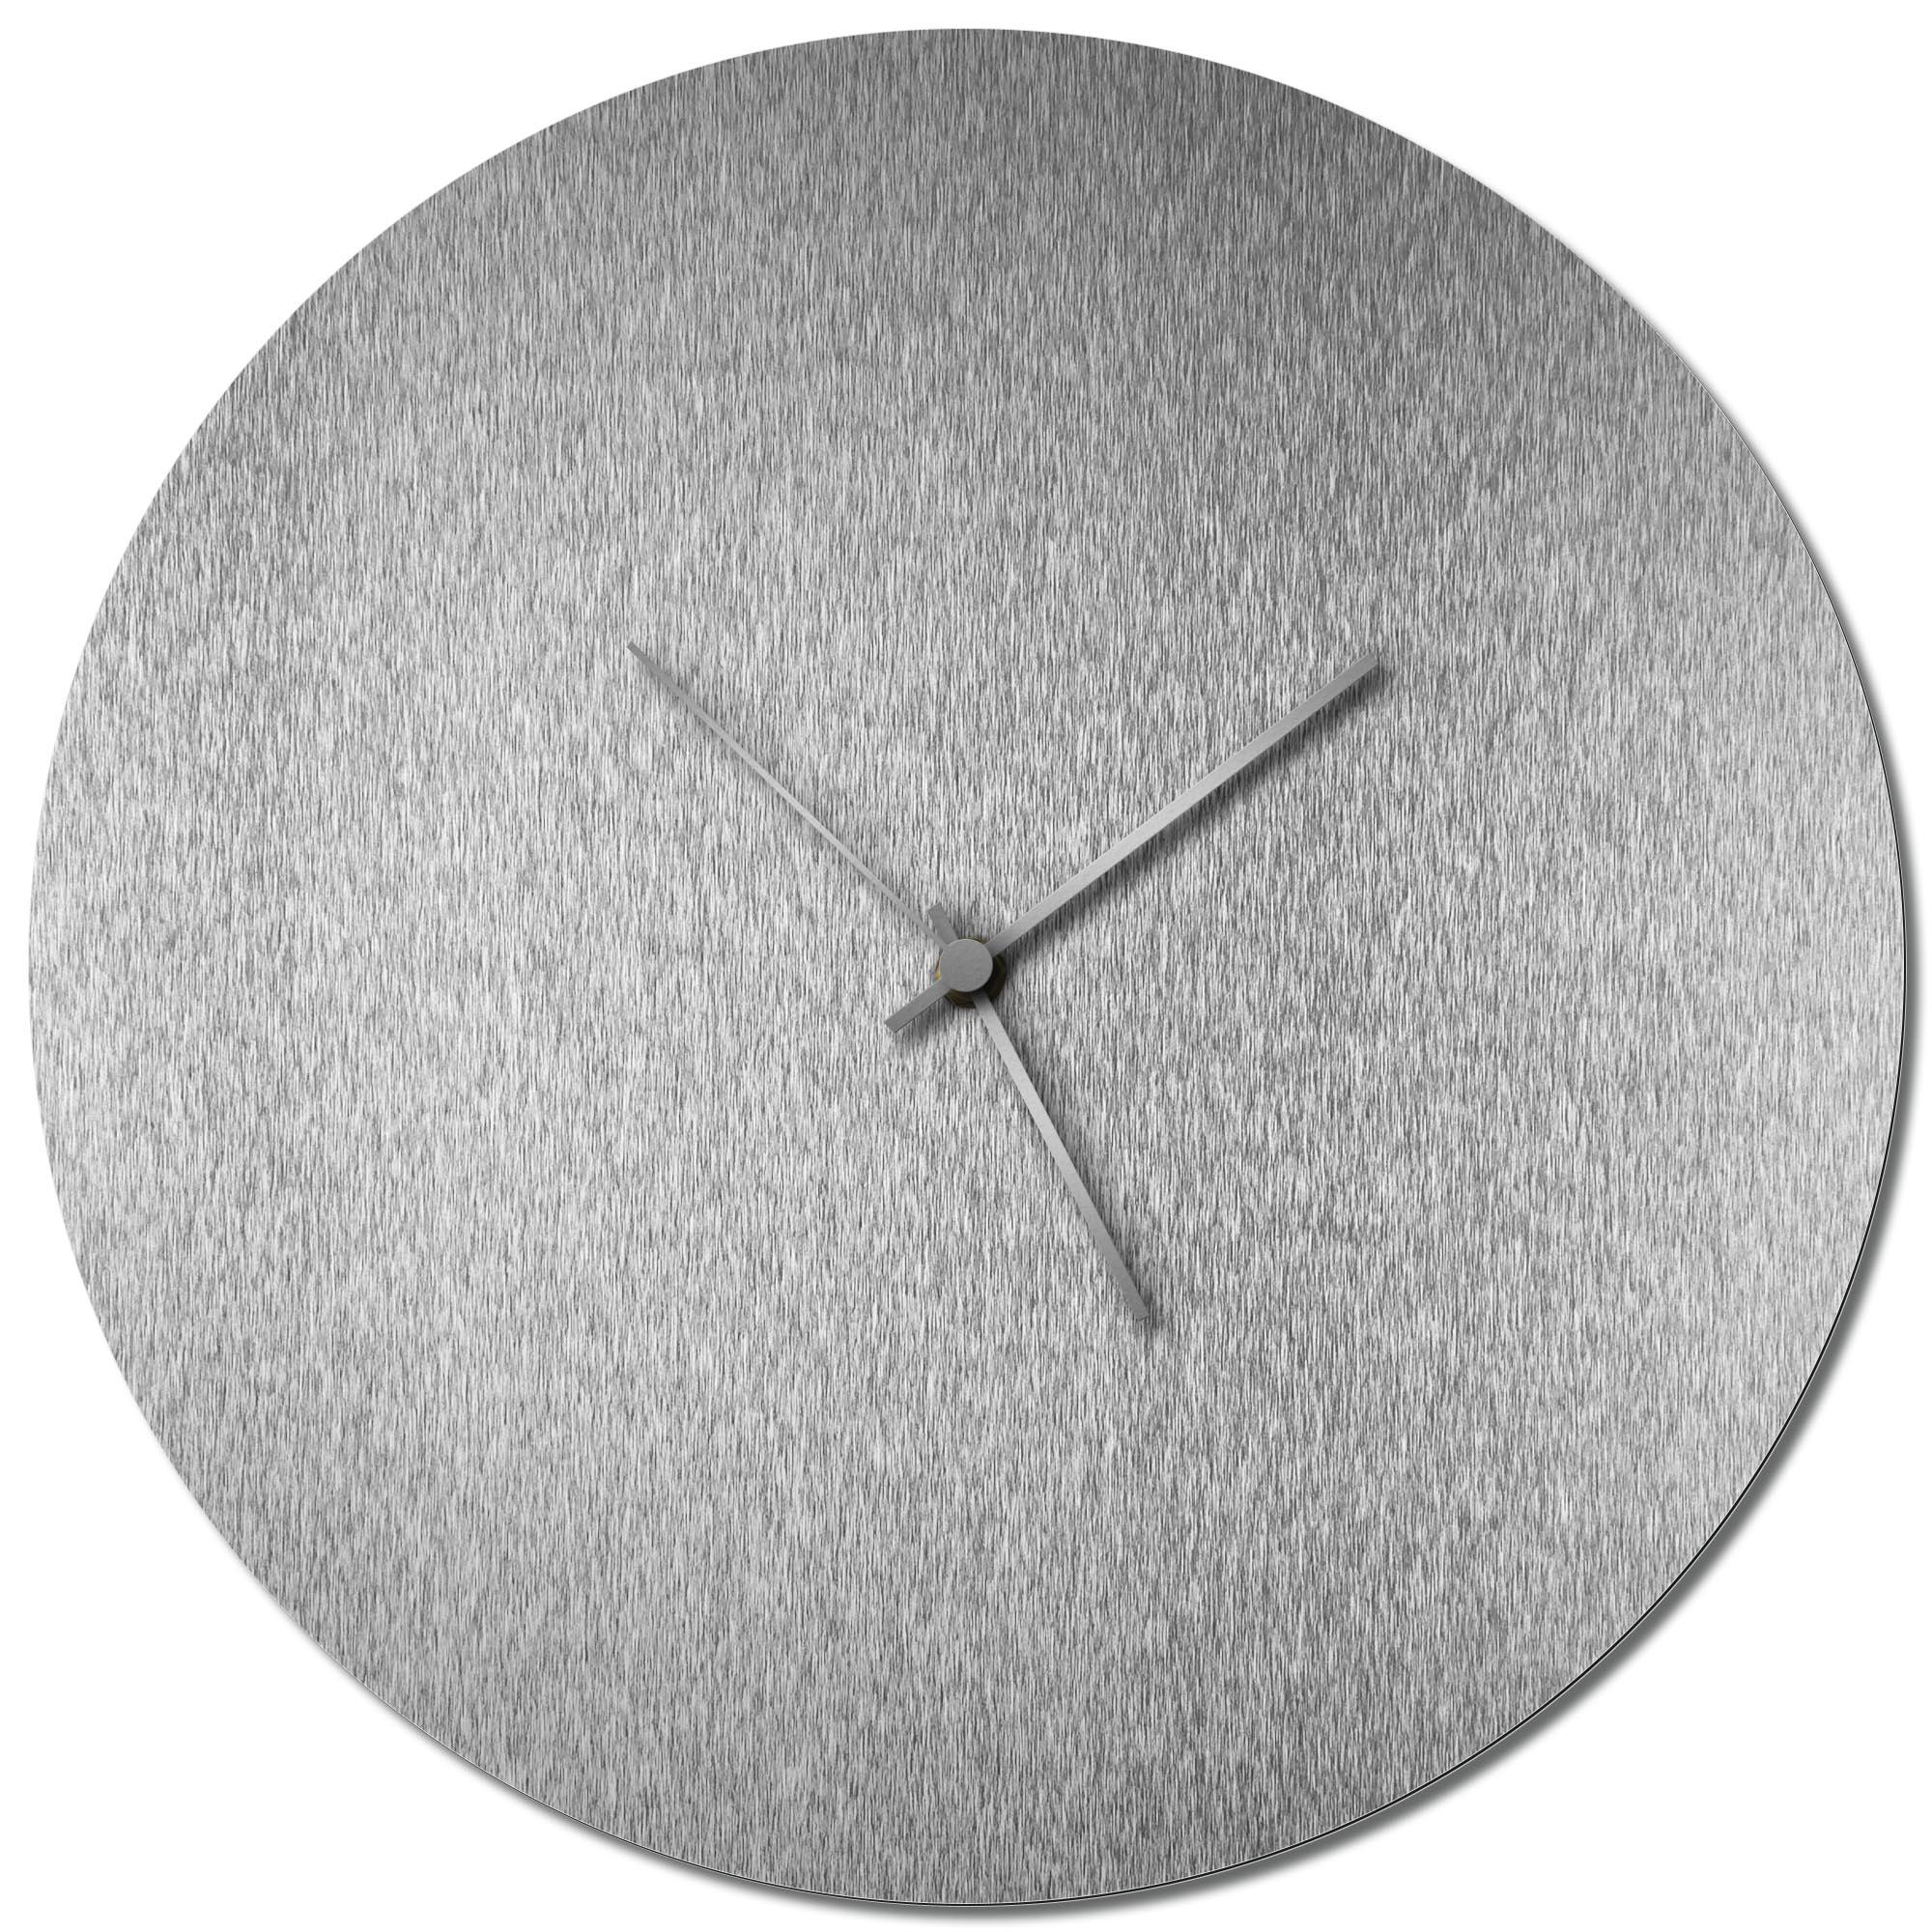 Adam Schwoeppe 'Silversmith Circle Clock Large Silver' Midcentury Modern Style Wall Clock